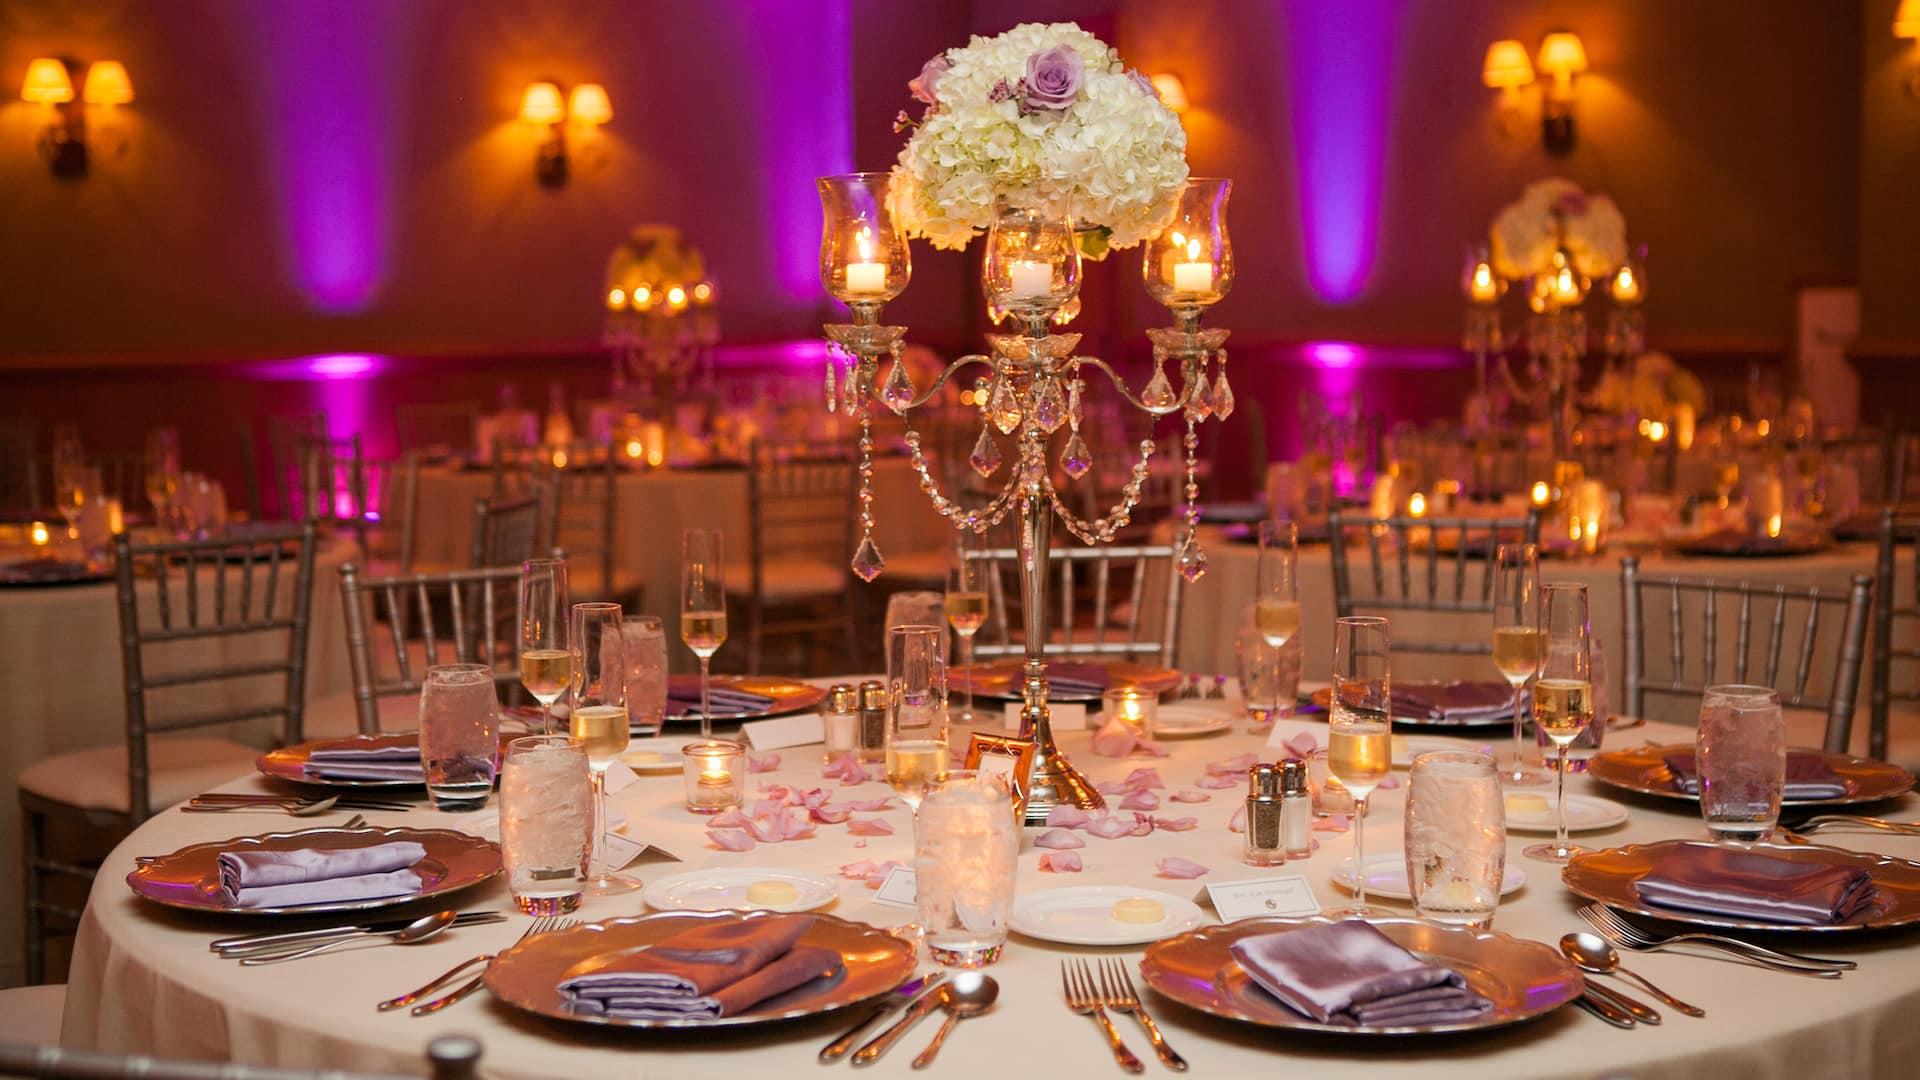 Clearwater beach wedding venue hosting reception